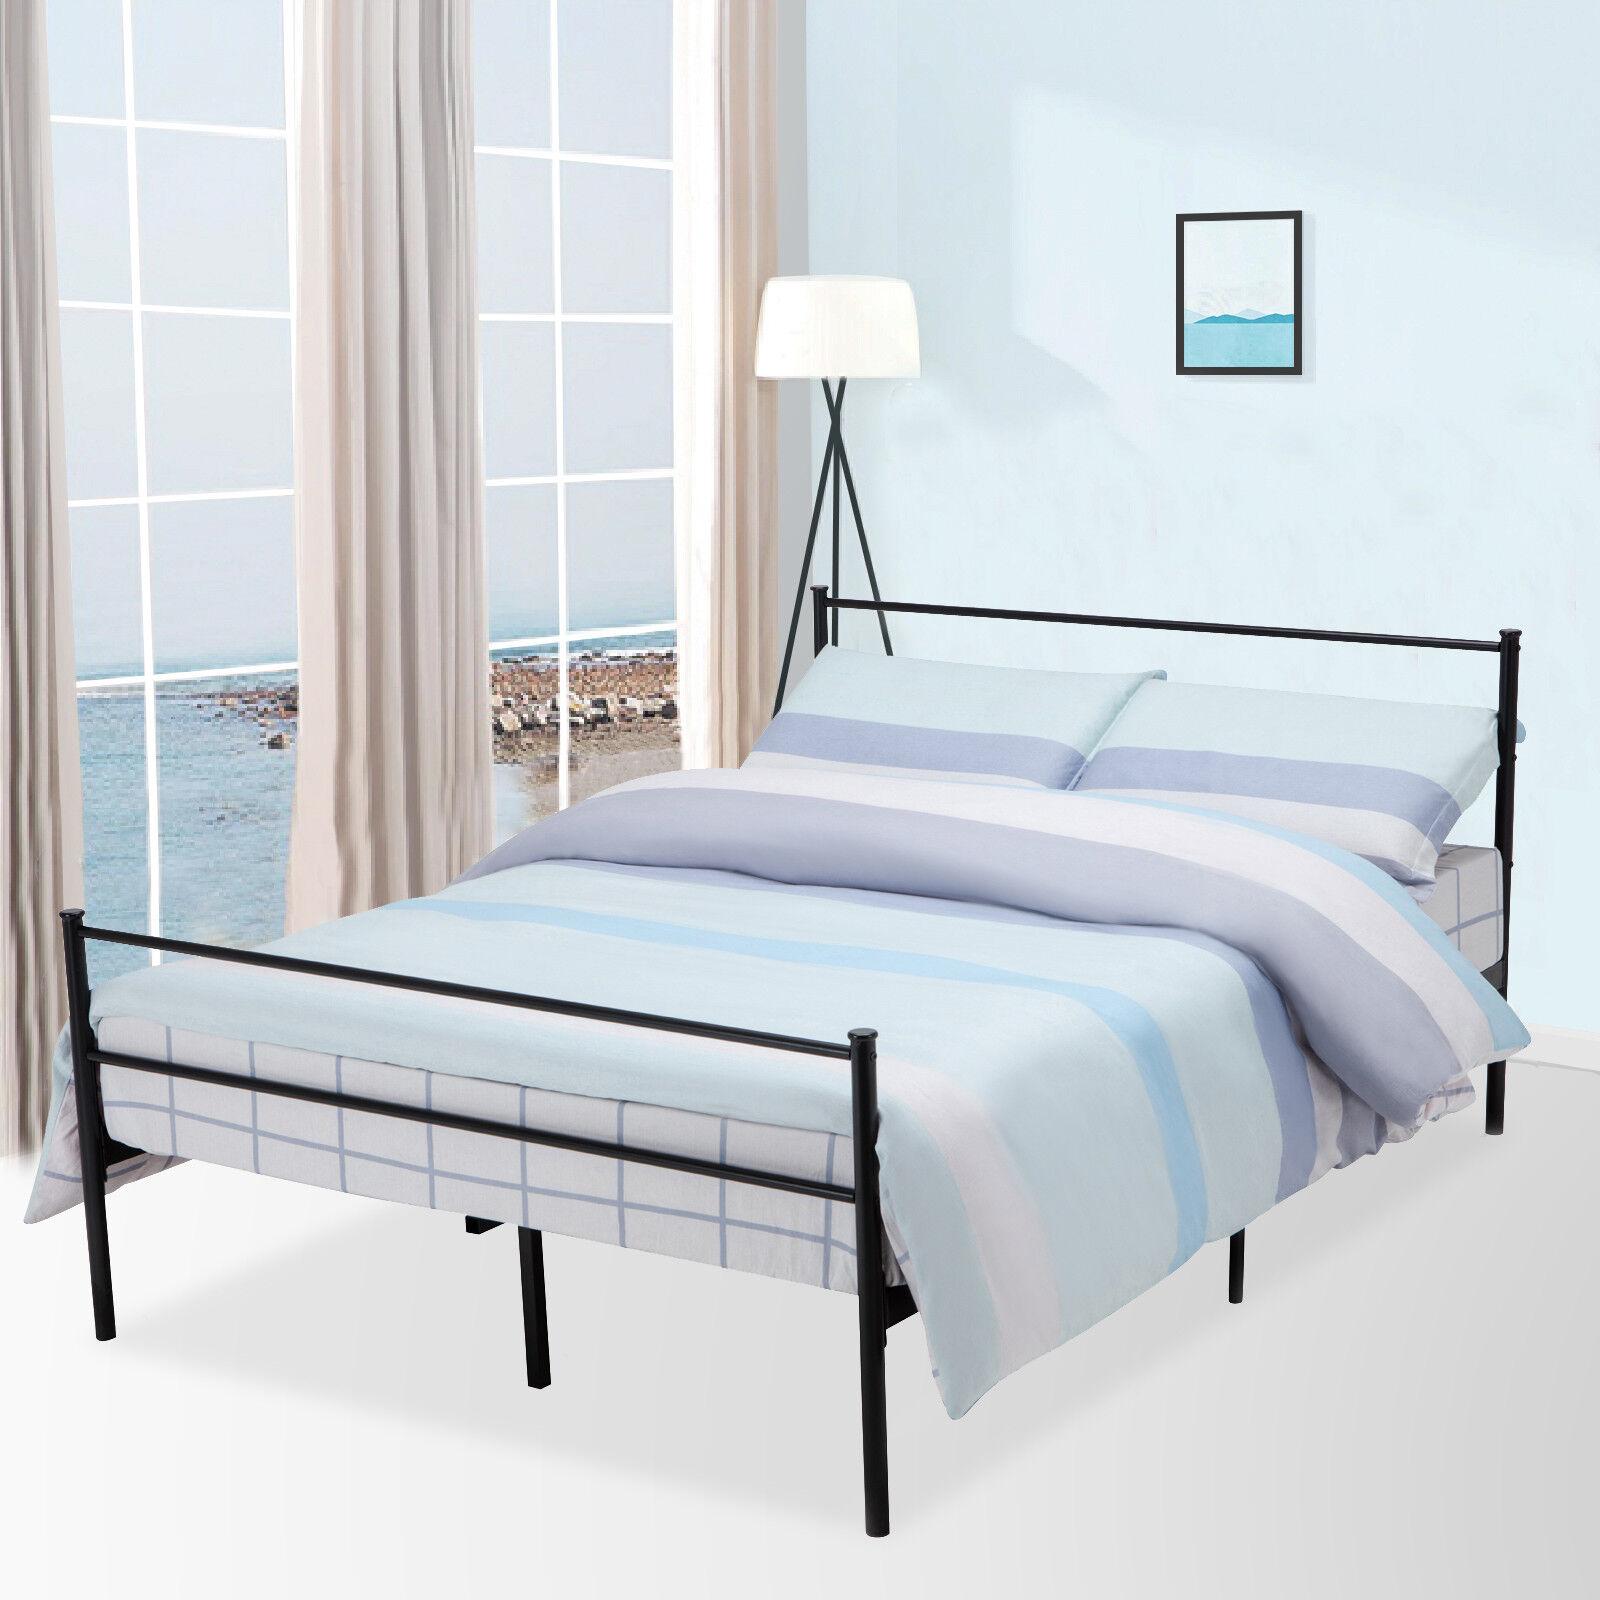 Details about Queen Size Metal Bed Frame Platform Headboards w/ 6 Legs  Bedroom Furniture Black